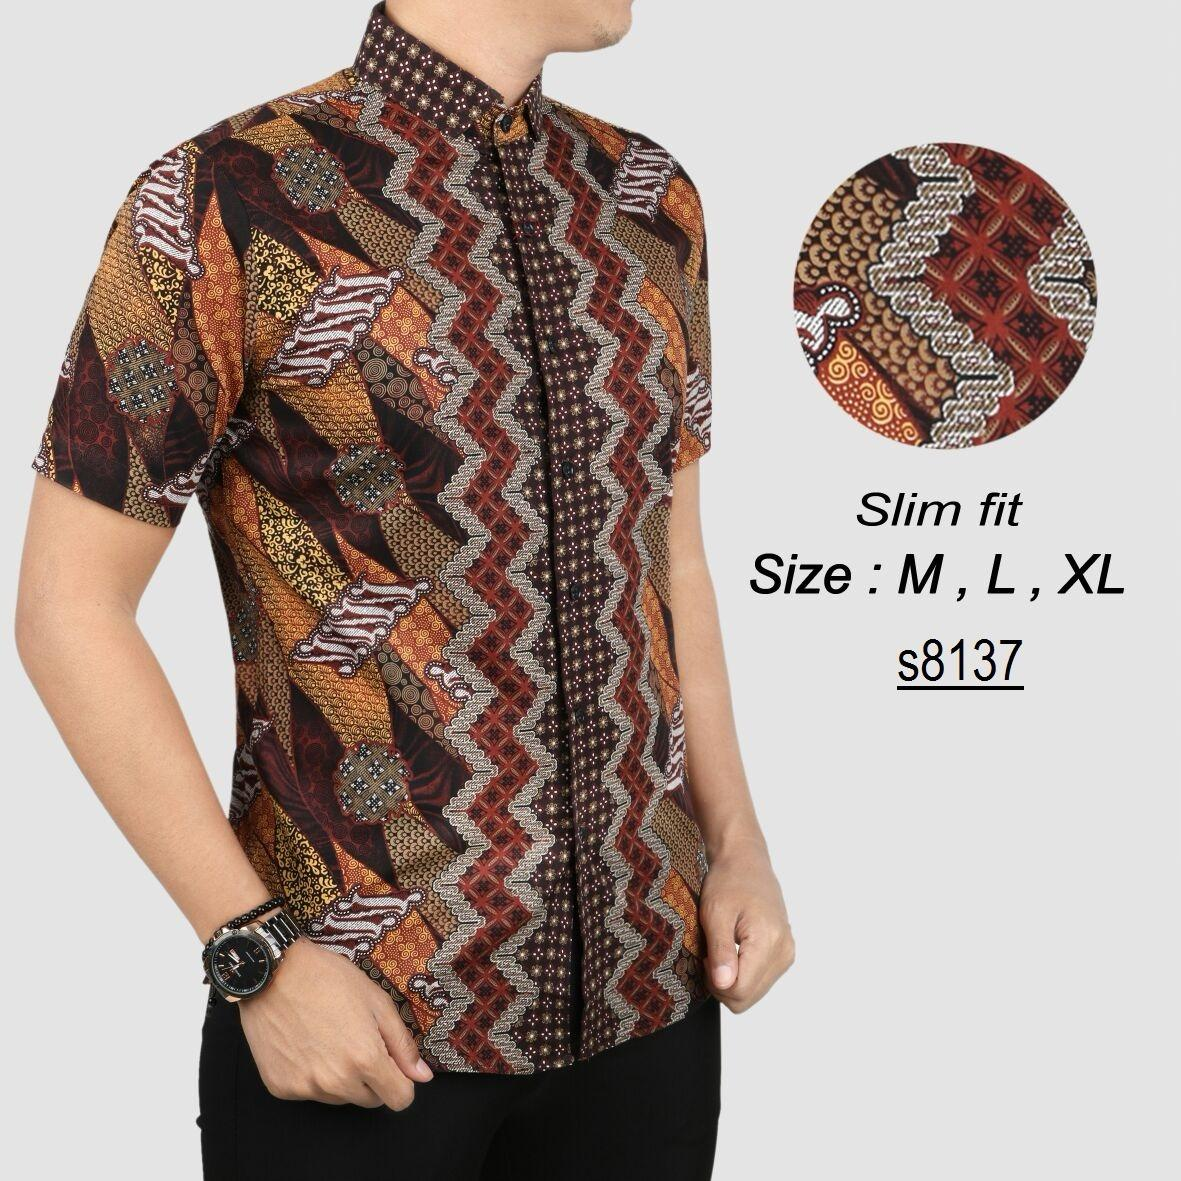 Koleksi Batik Pria Modern: Cek Harga Baru Batik Pria Modern Kemeja Pria Slim Fit 9305